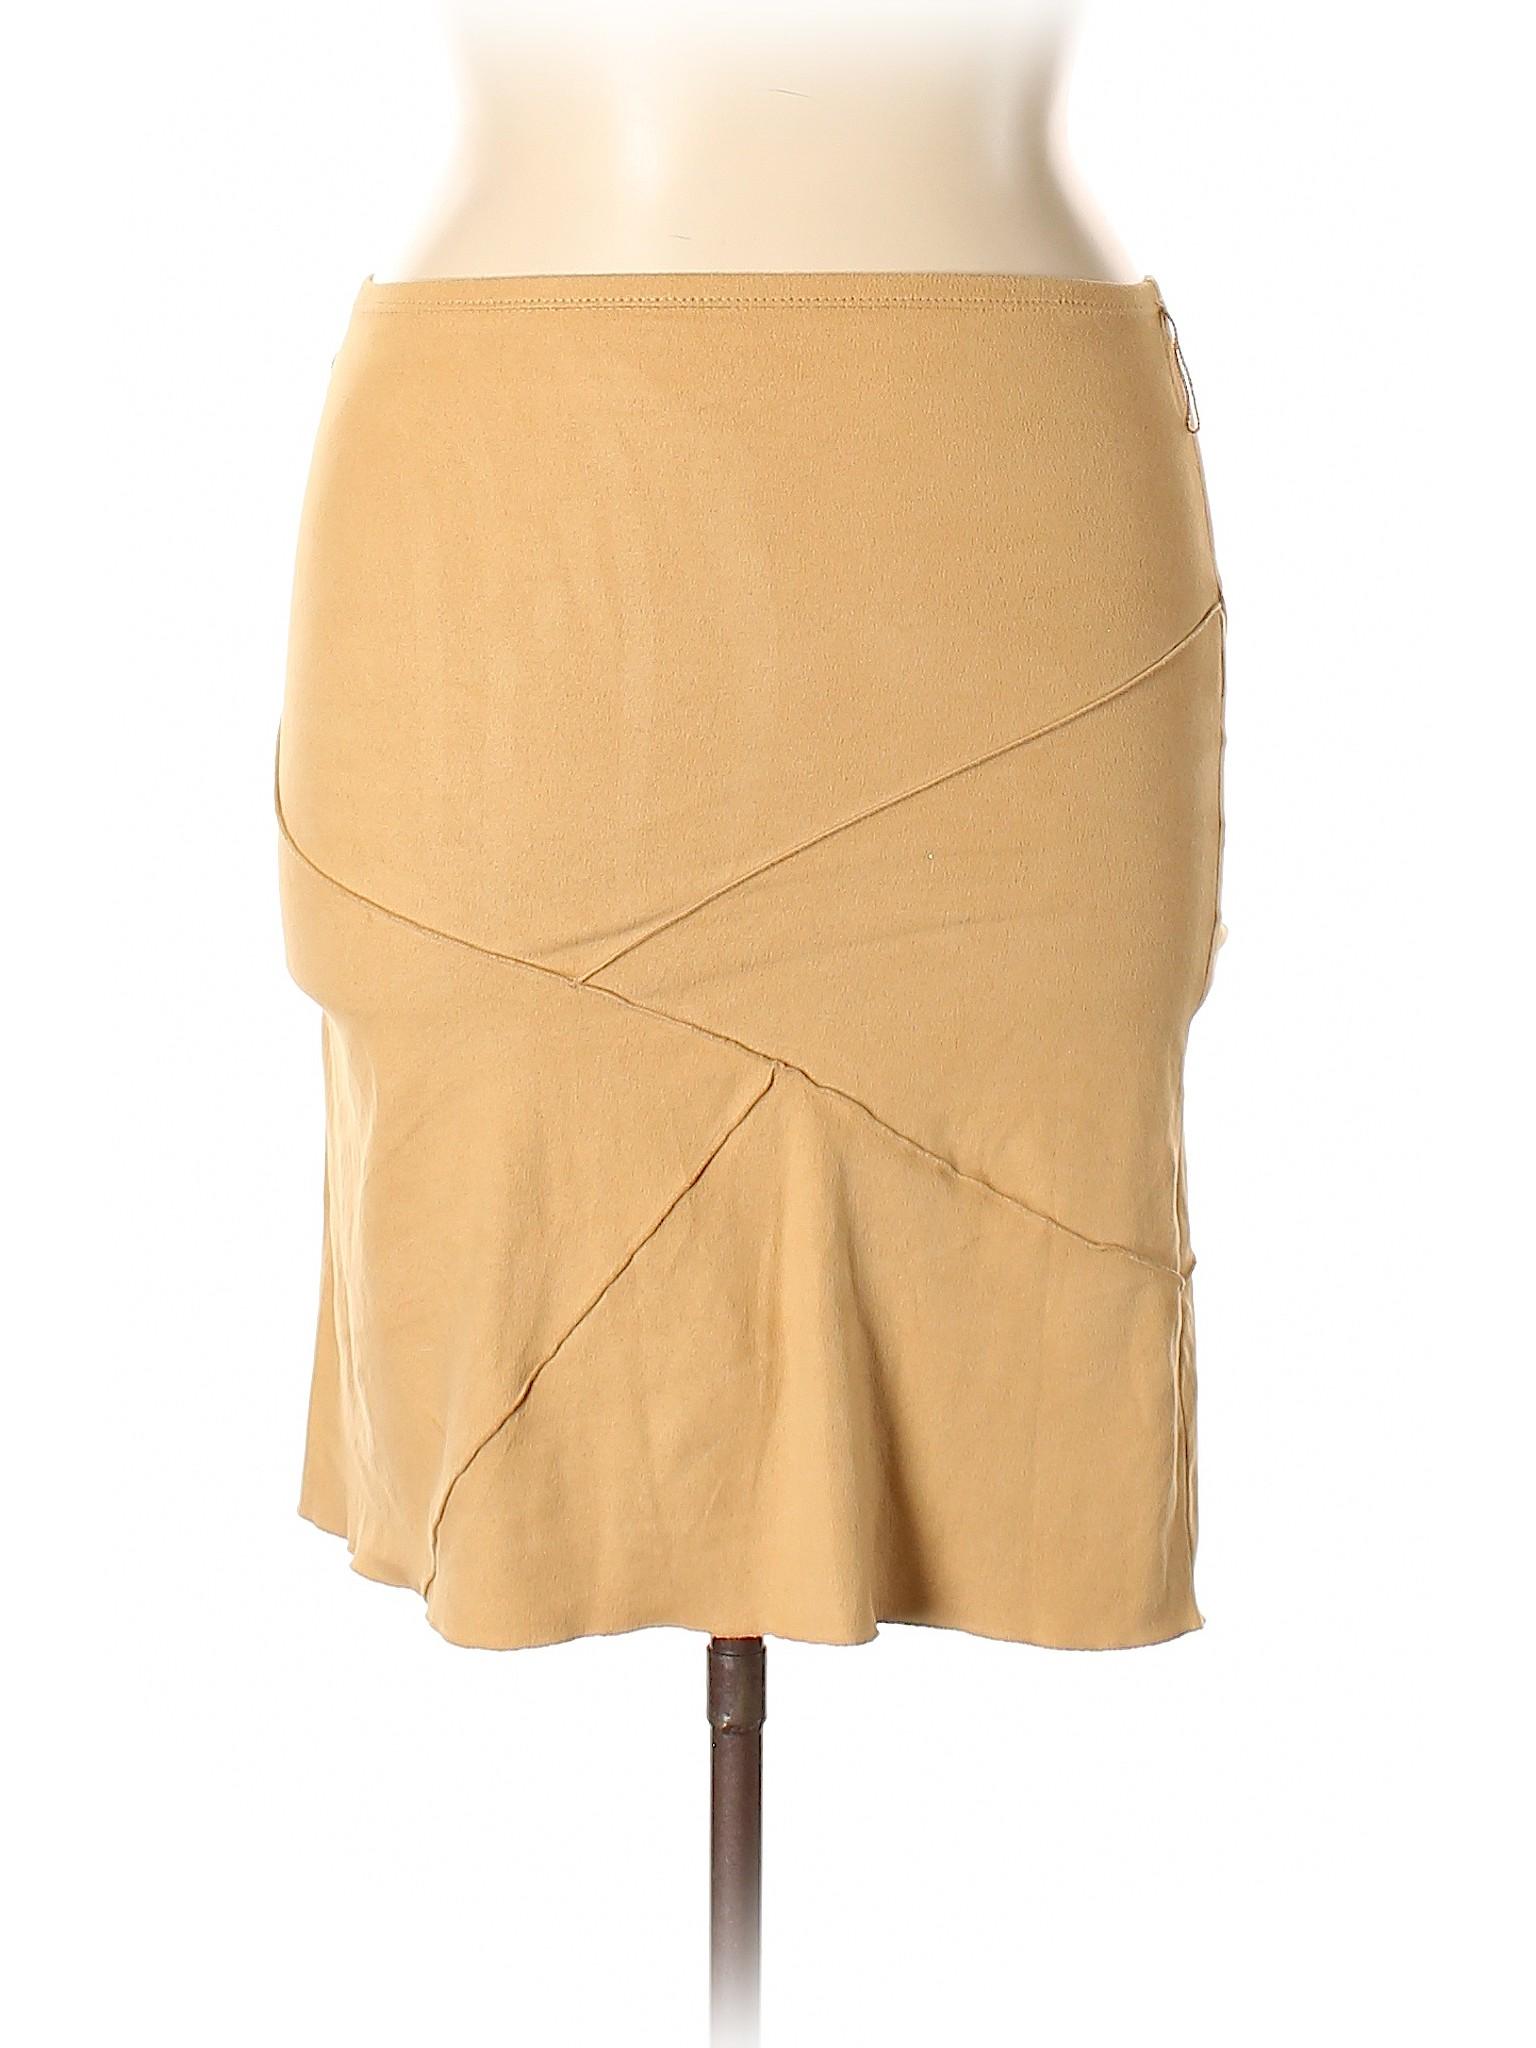 Boutique Boutique Casual Casual Skirt HnwqvURW1